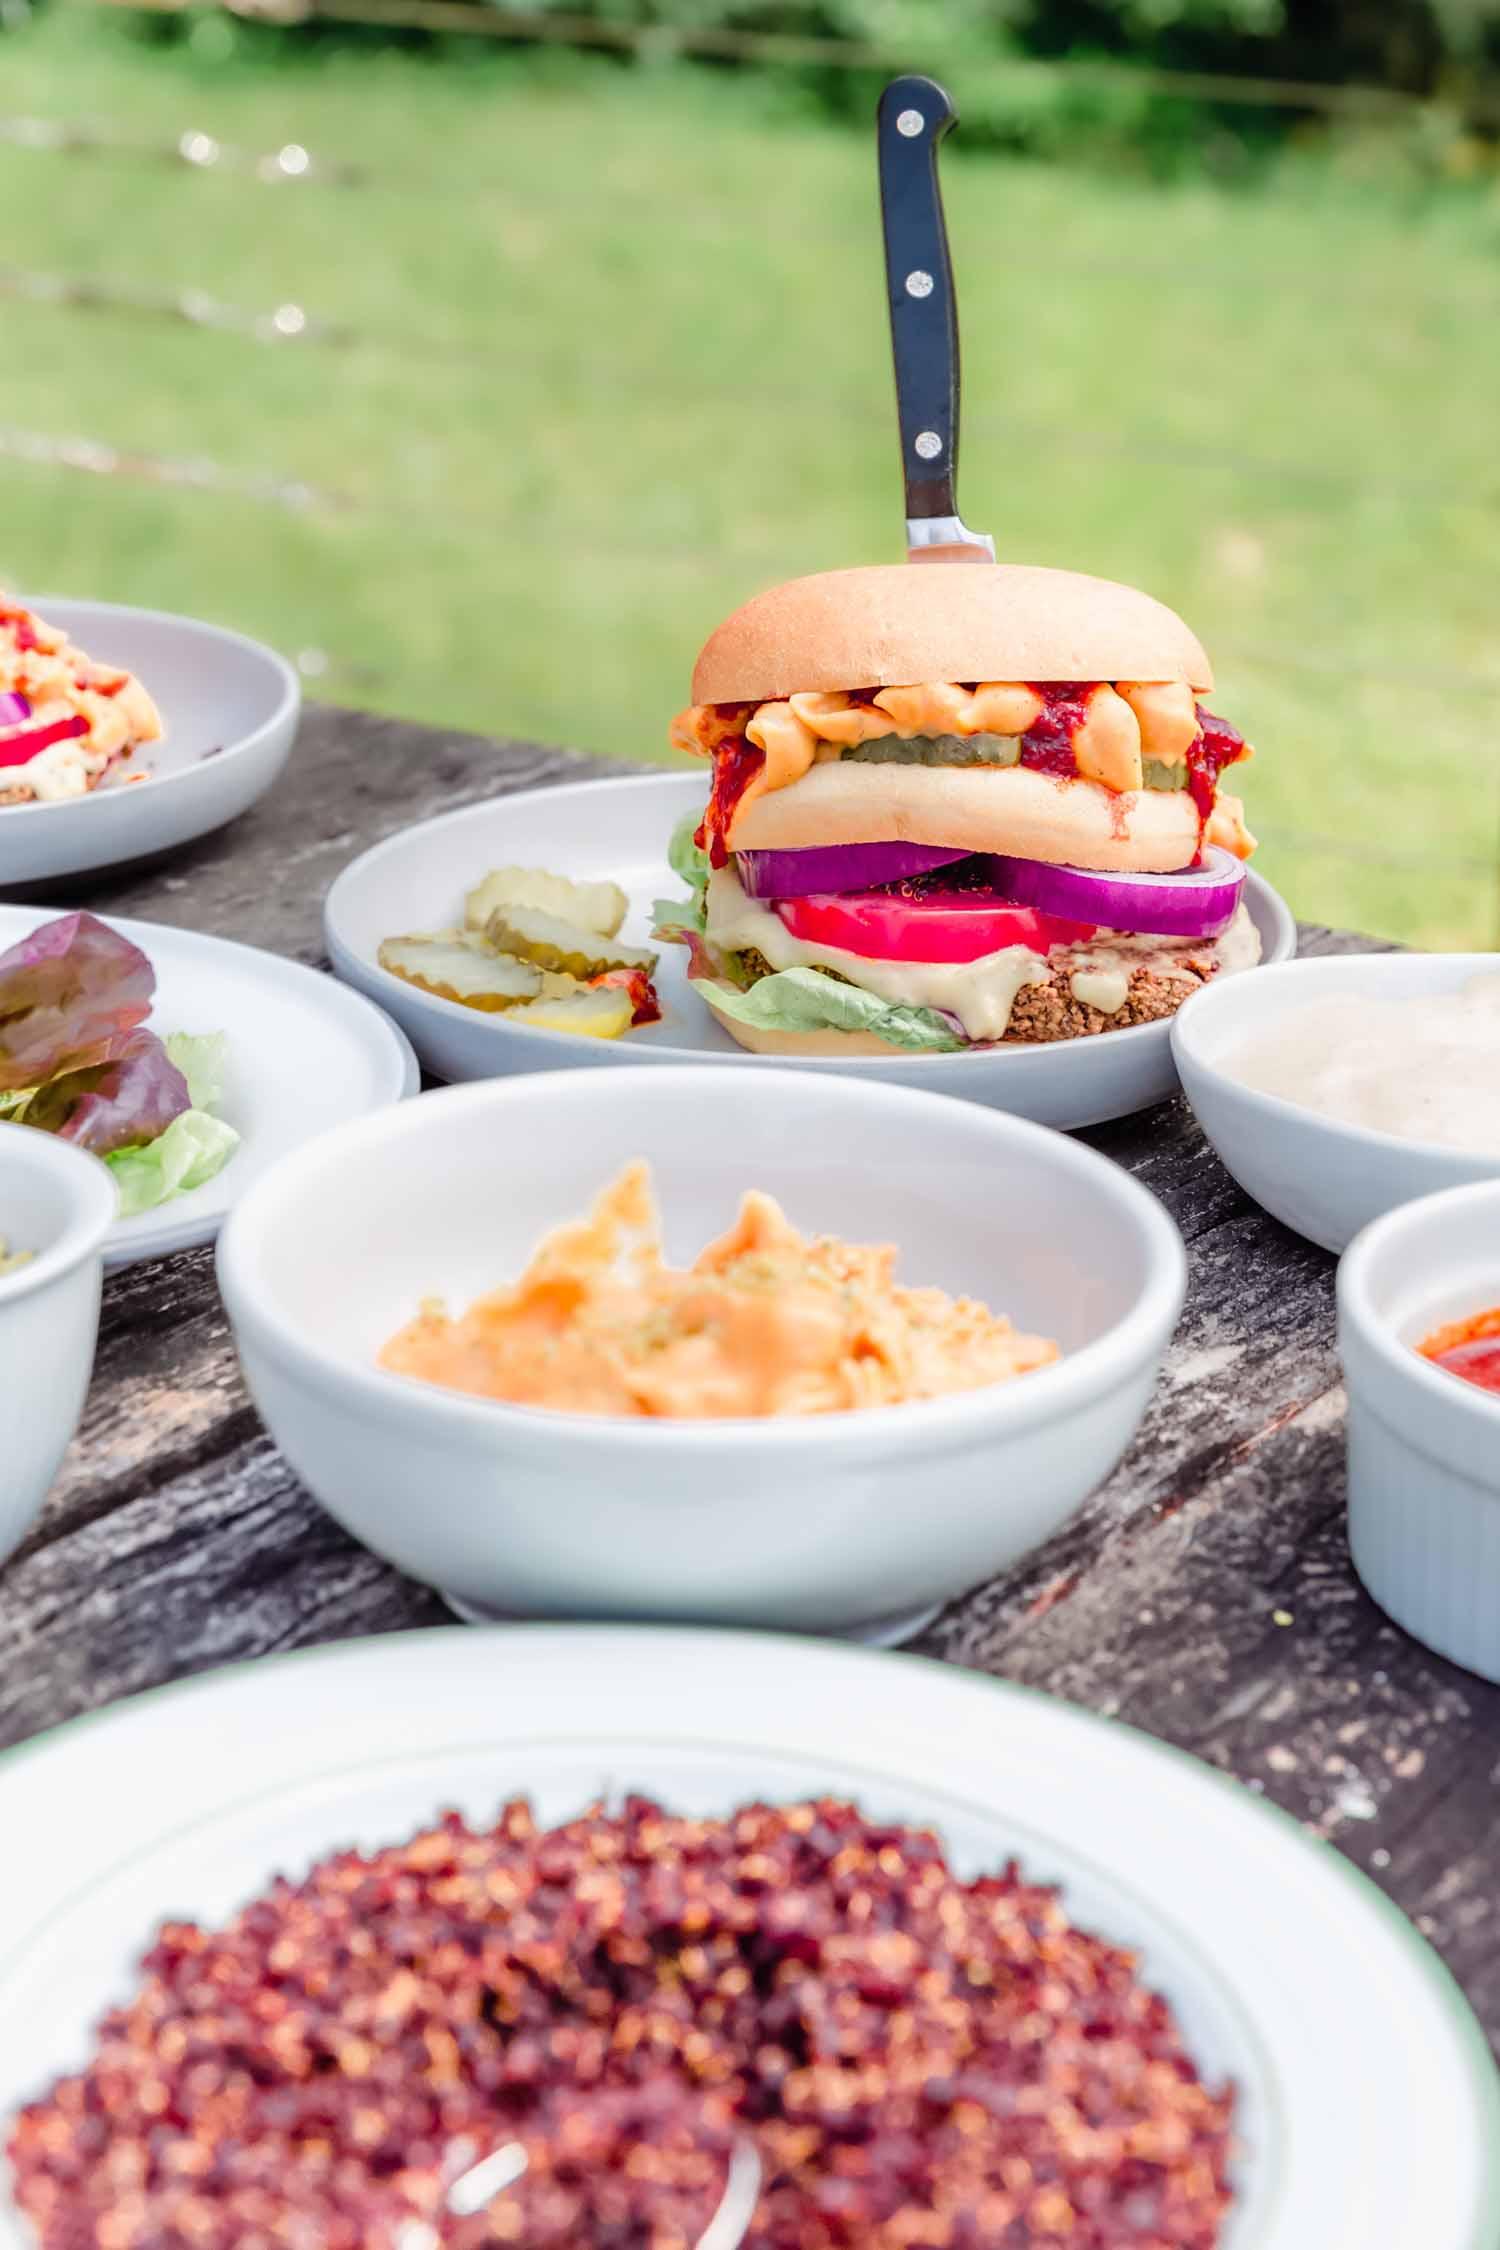 Bacon Mac and Cheese BBQ Blue Burger from  Epic Vegan  by Dustin Harder. Photo by Kari of Beautiful Ingredient. #veganburger #veggieburger #recipe #veggieburgerrecipe #summerrecipe #epicvegan #veganrecipe